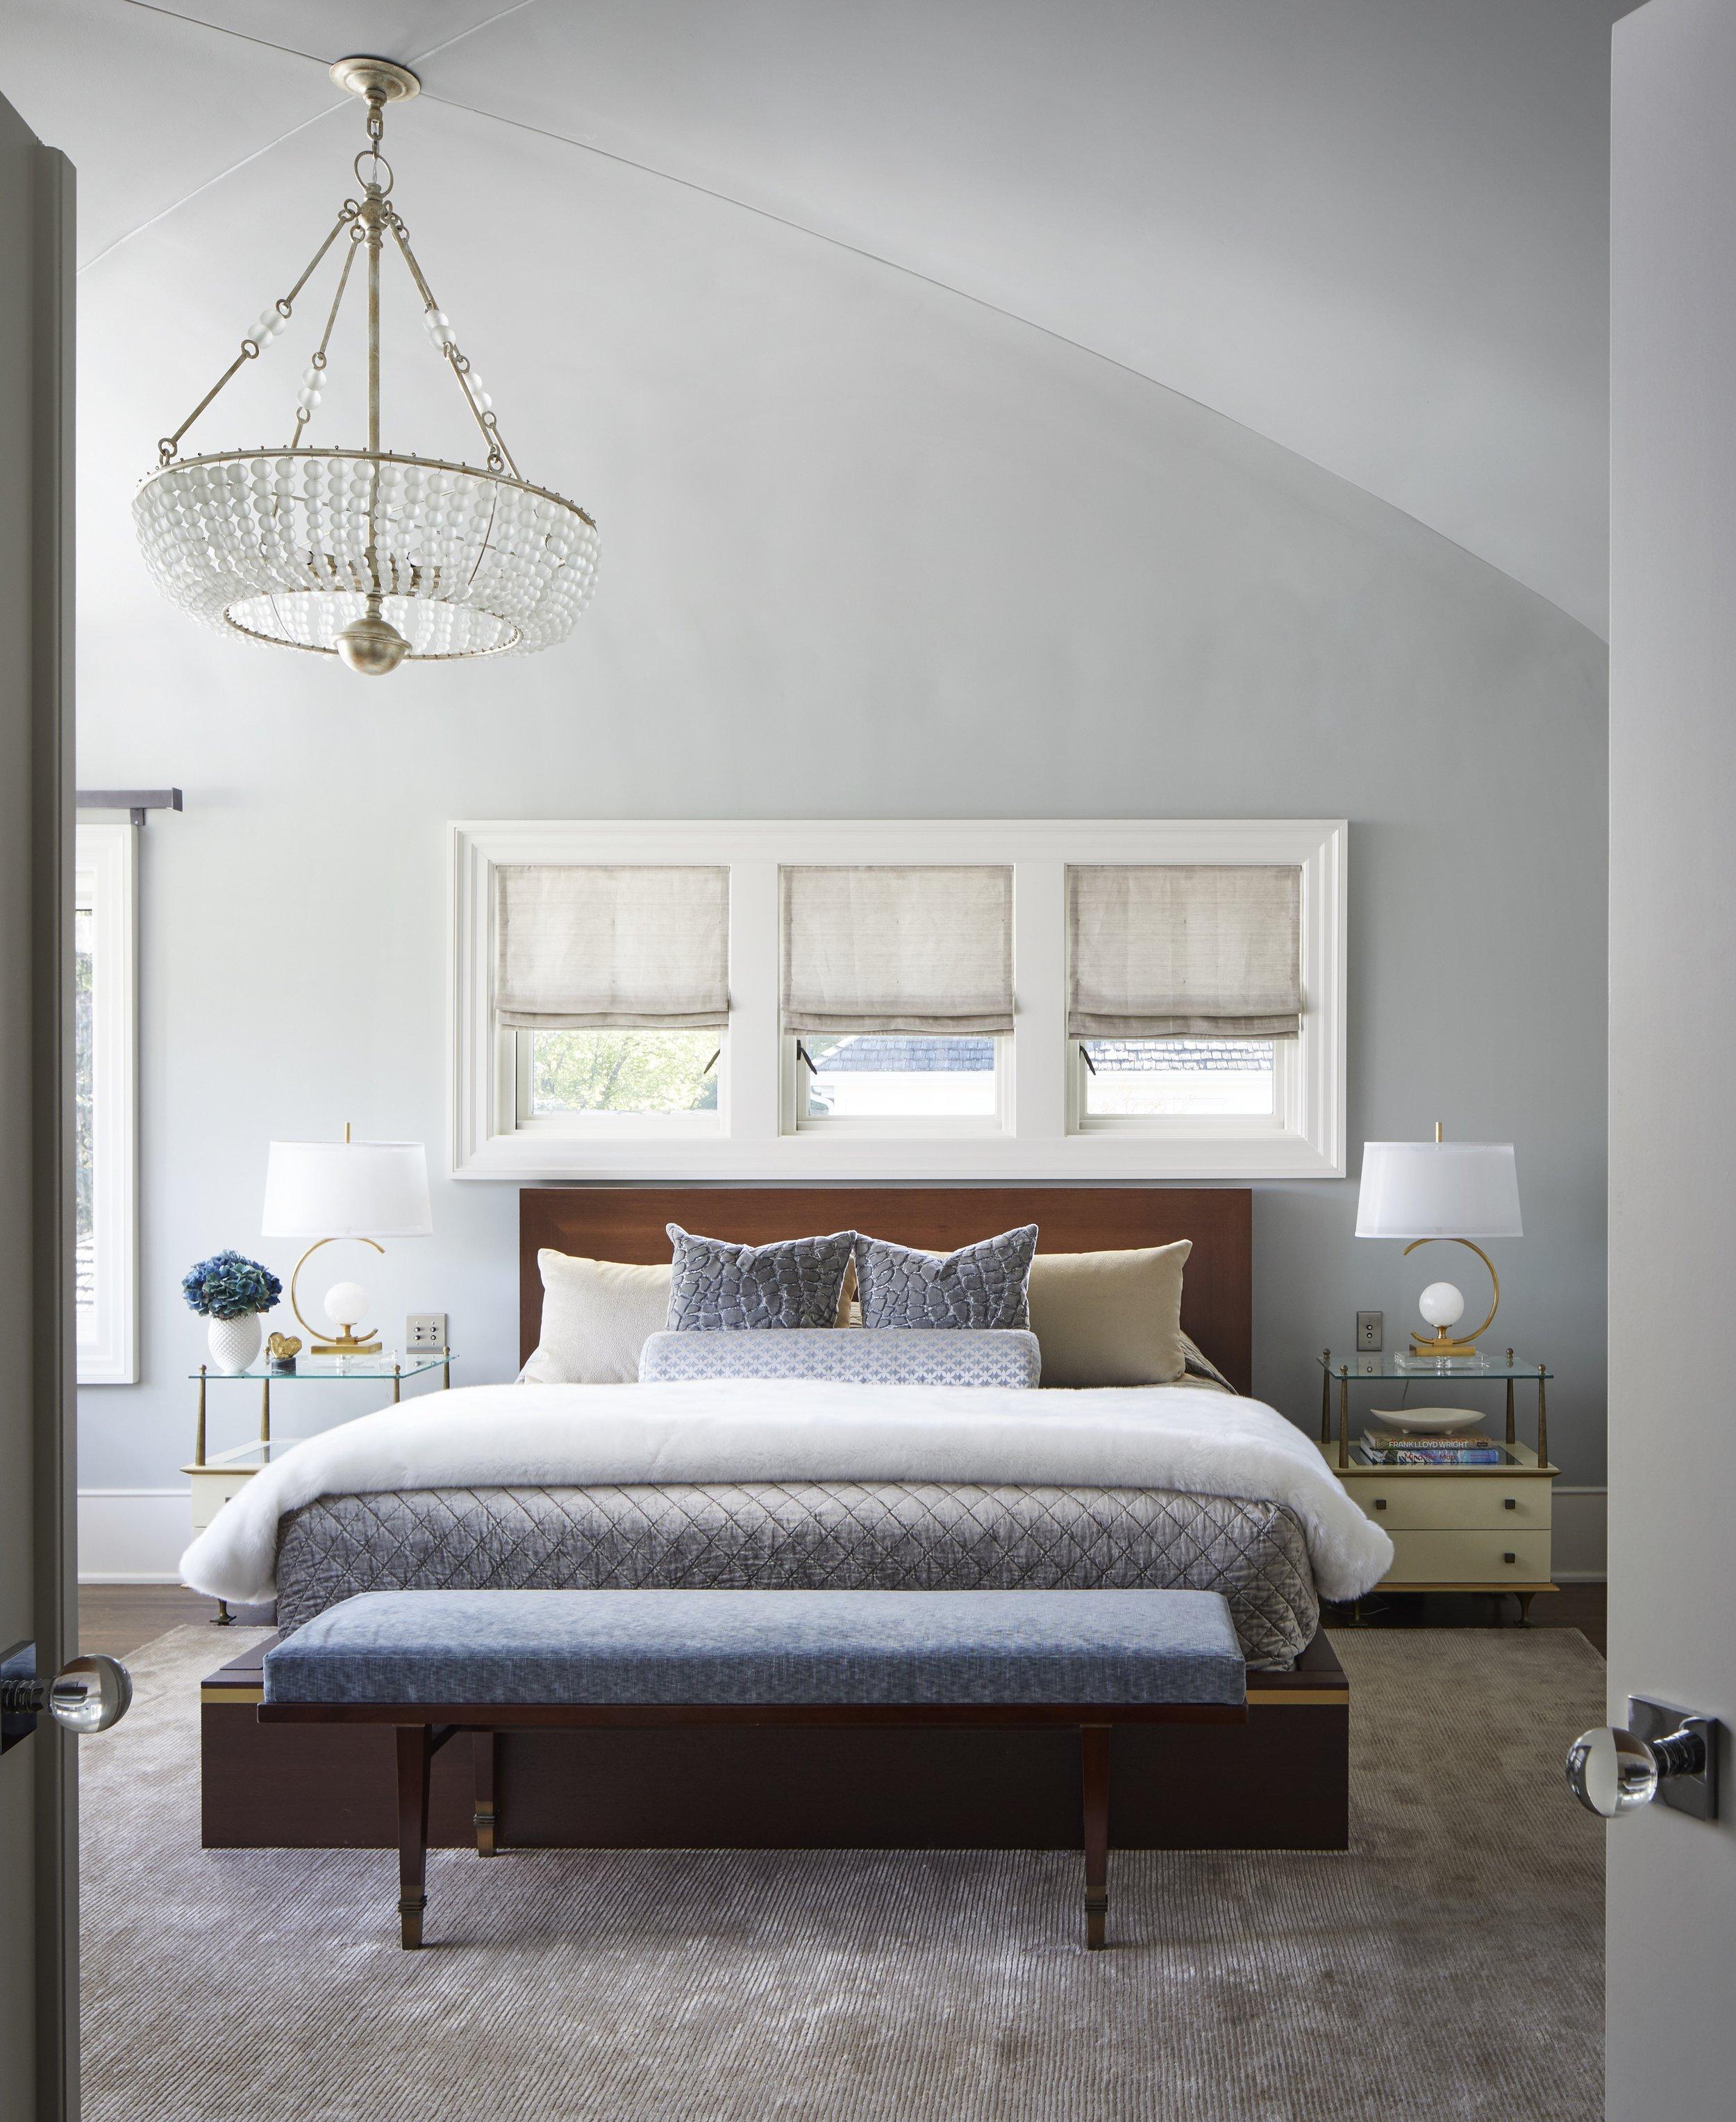 TH Bed.jpg